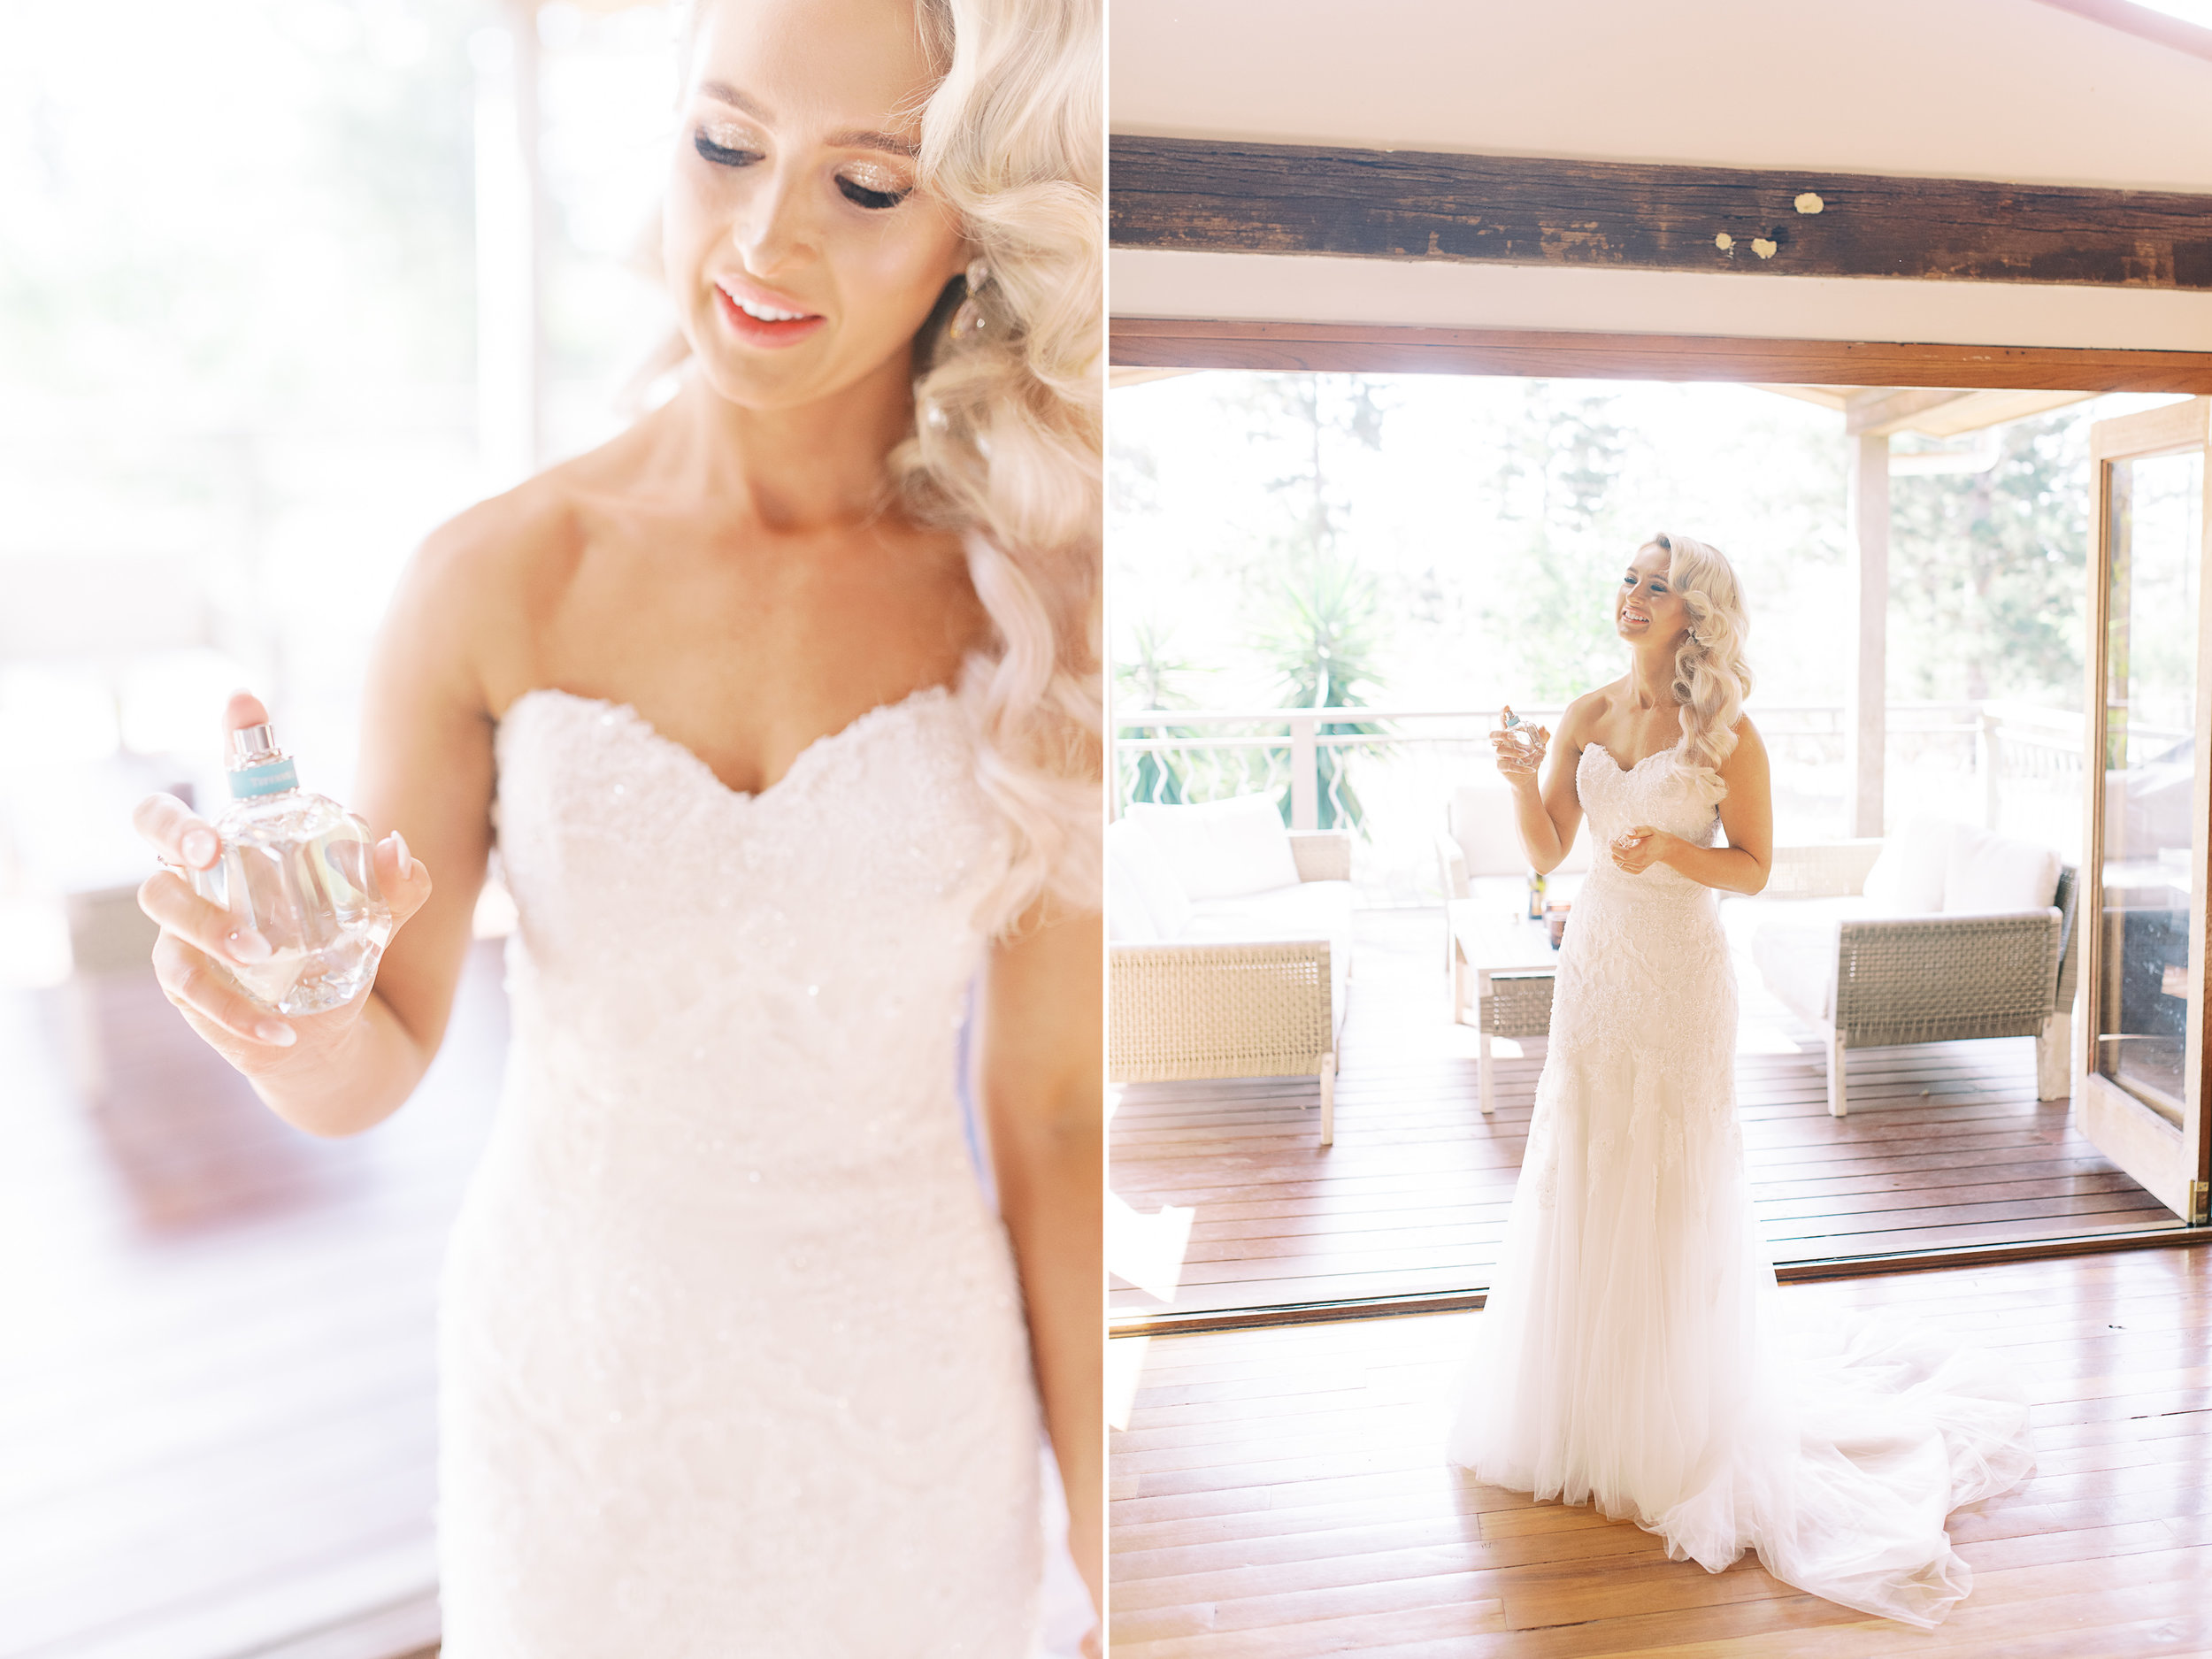 kooroomba-lavendar-farm-film-photography-wedding-photography-romantic-07.jpg